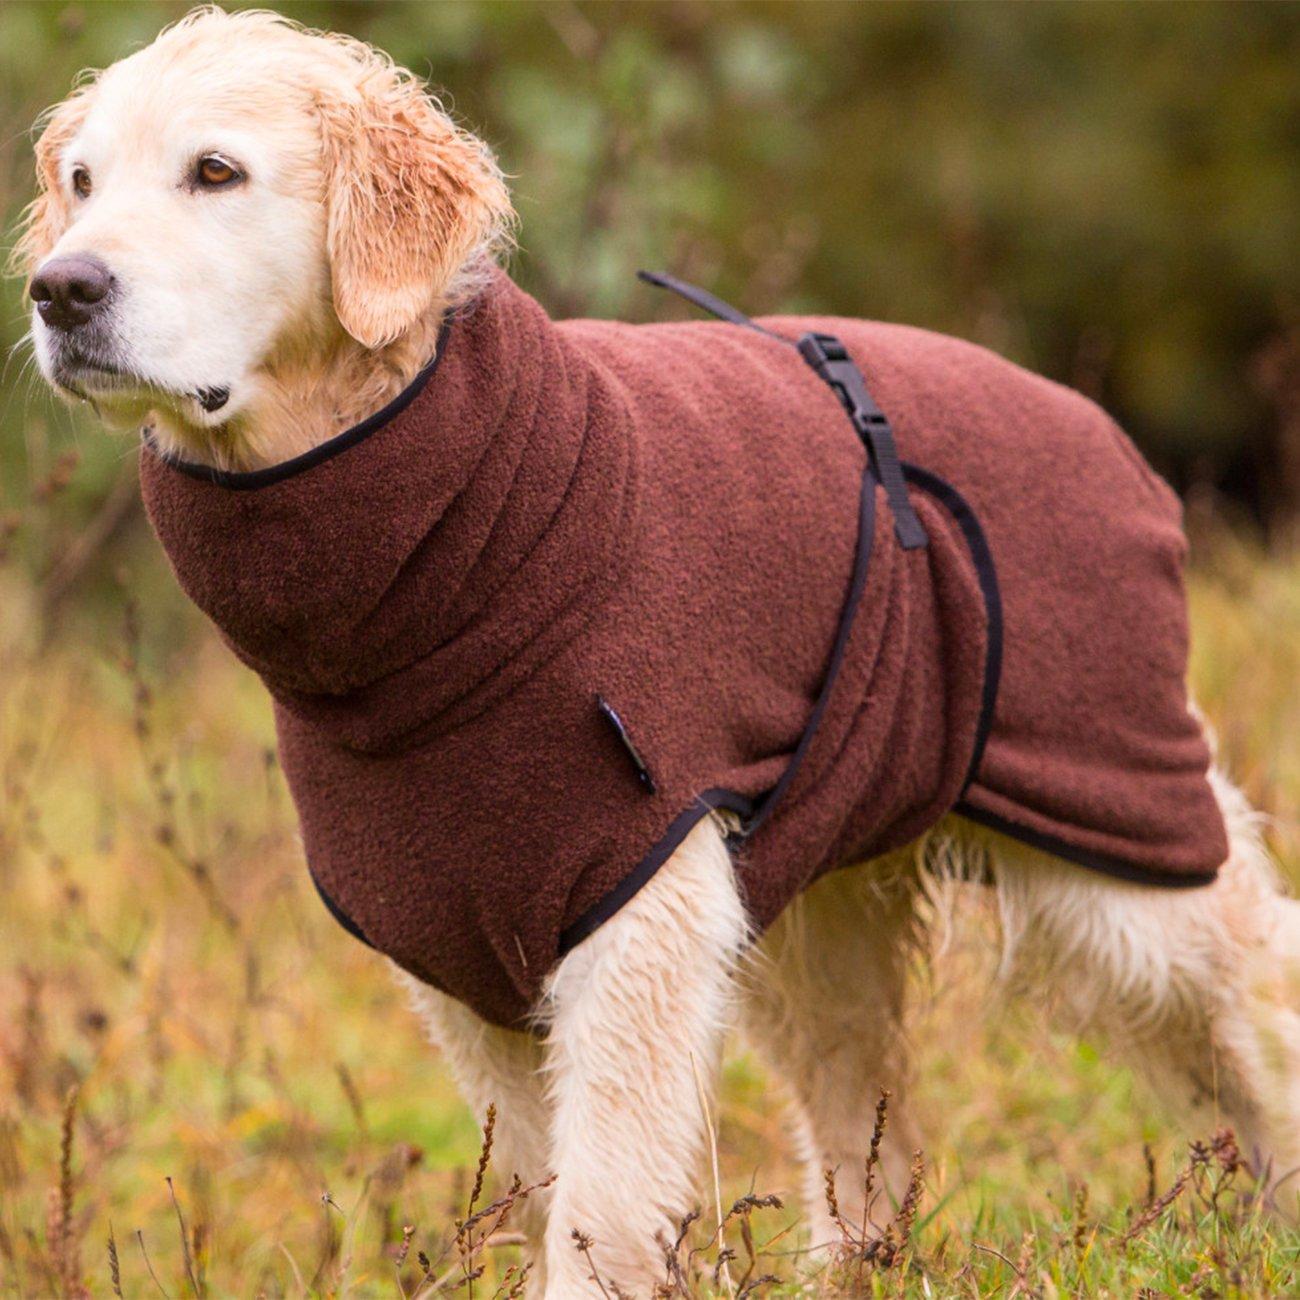 fit4dogs Trockenmantel Hund Dryup Cape, Bild 10